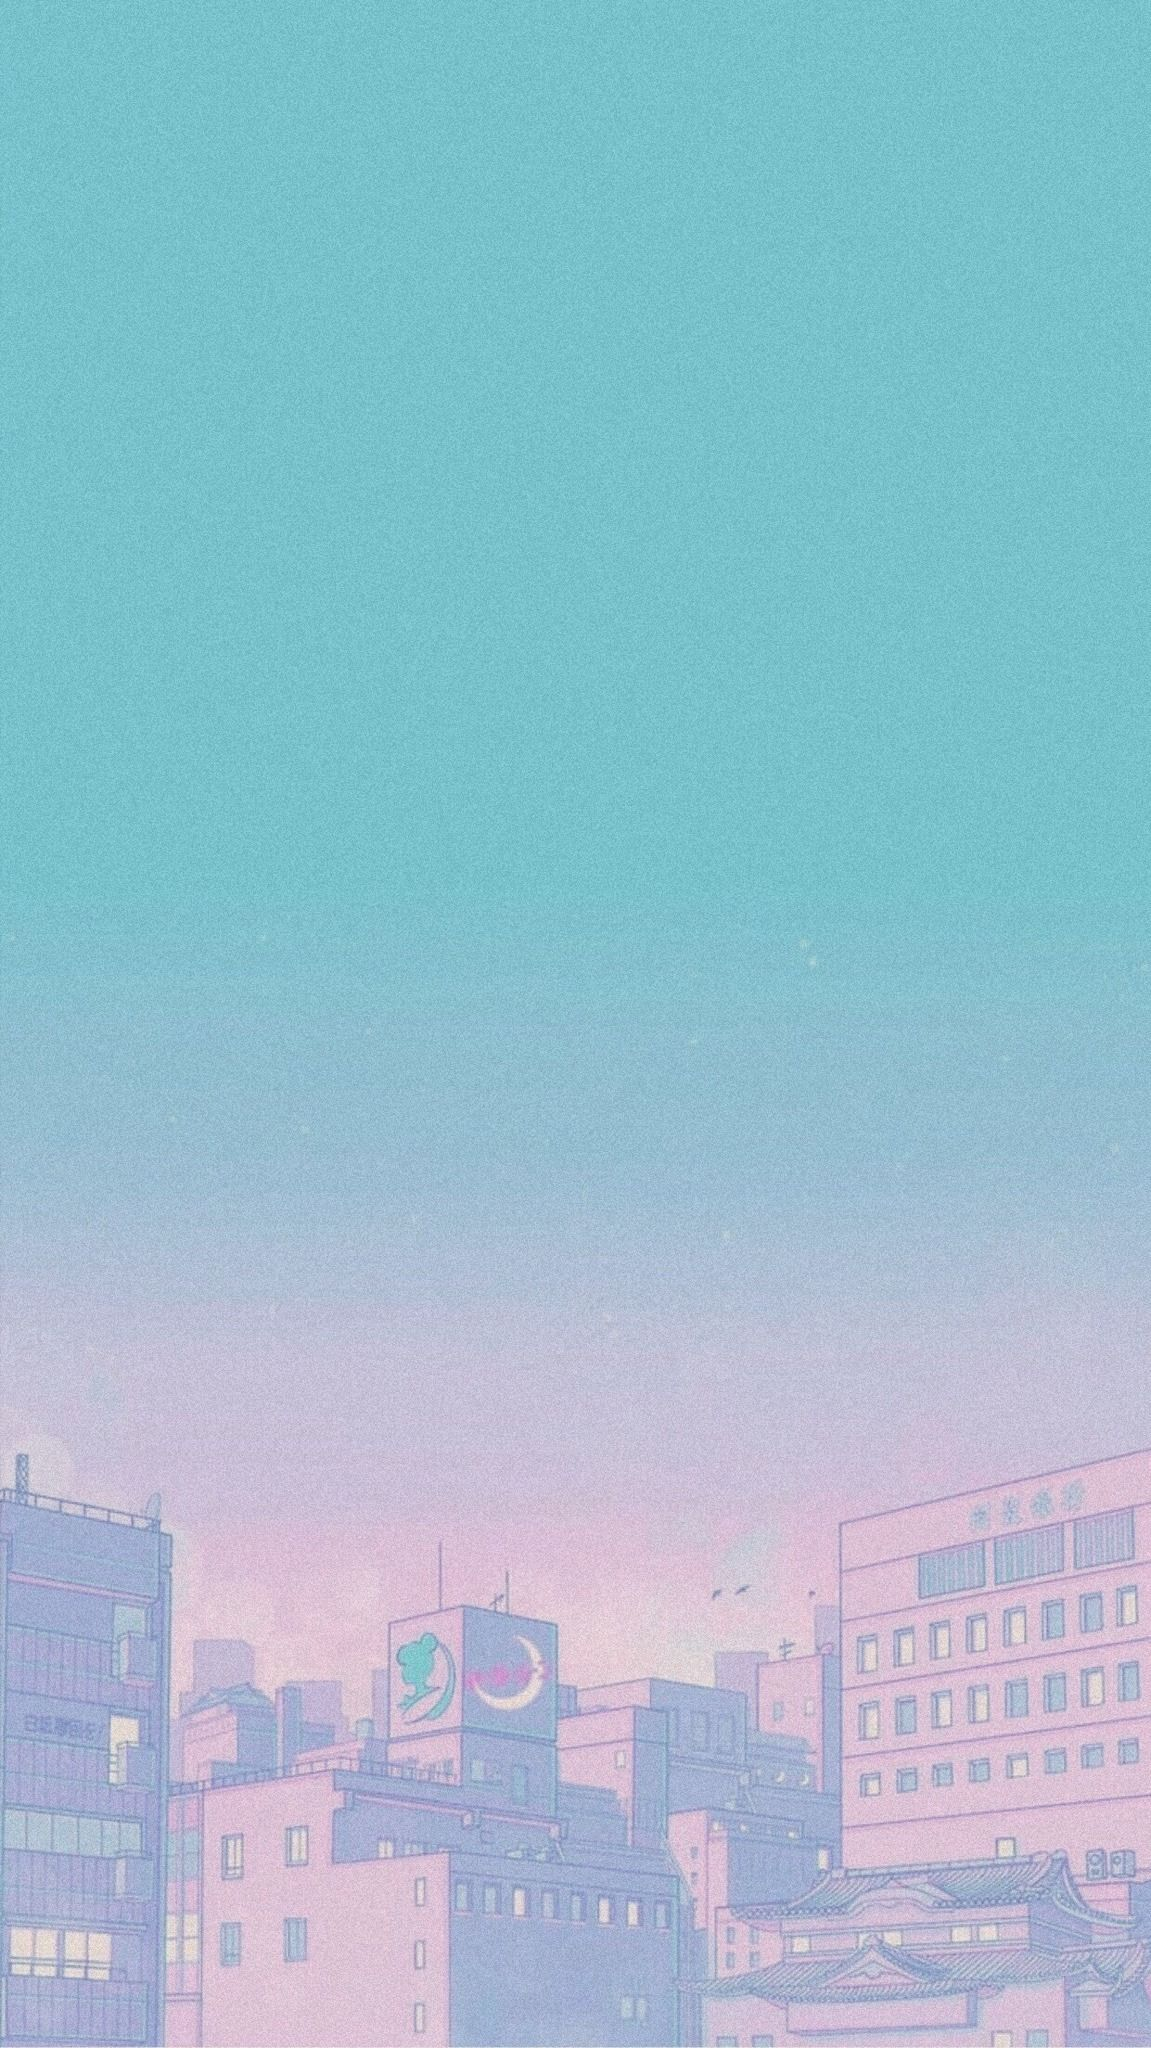 Pin Oleh Lil Moon Di She Pemandangan Anime Latar Belakang Ilustrasi